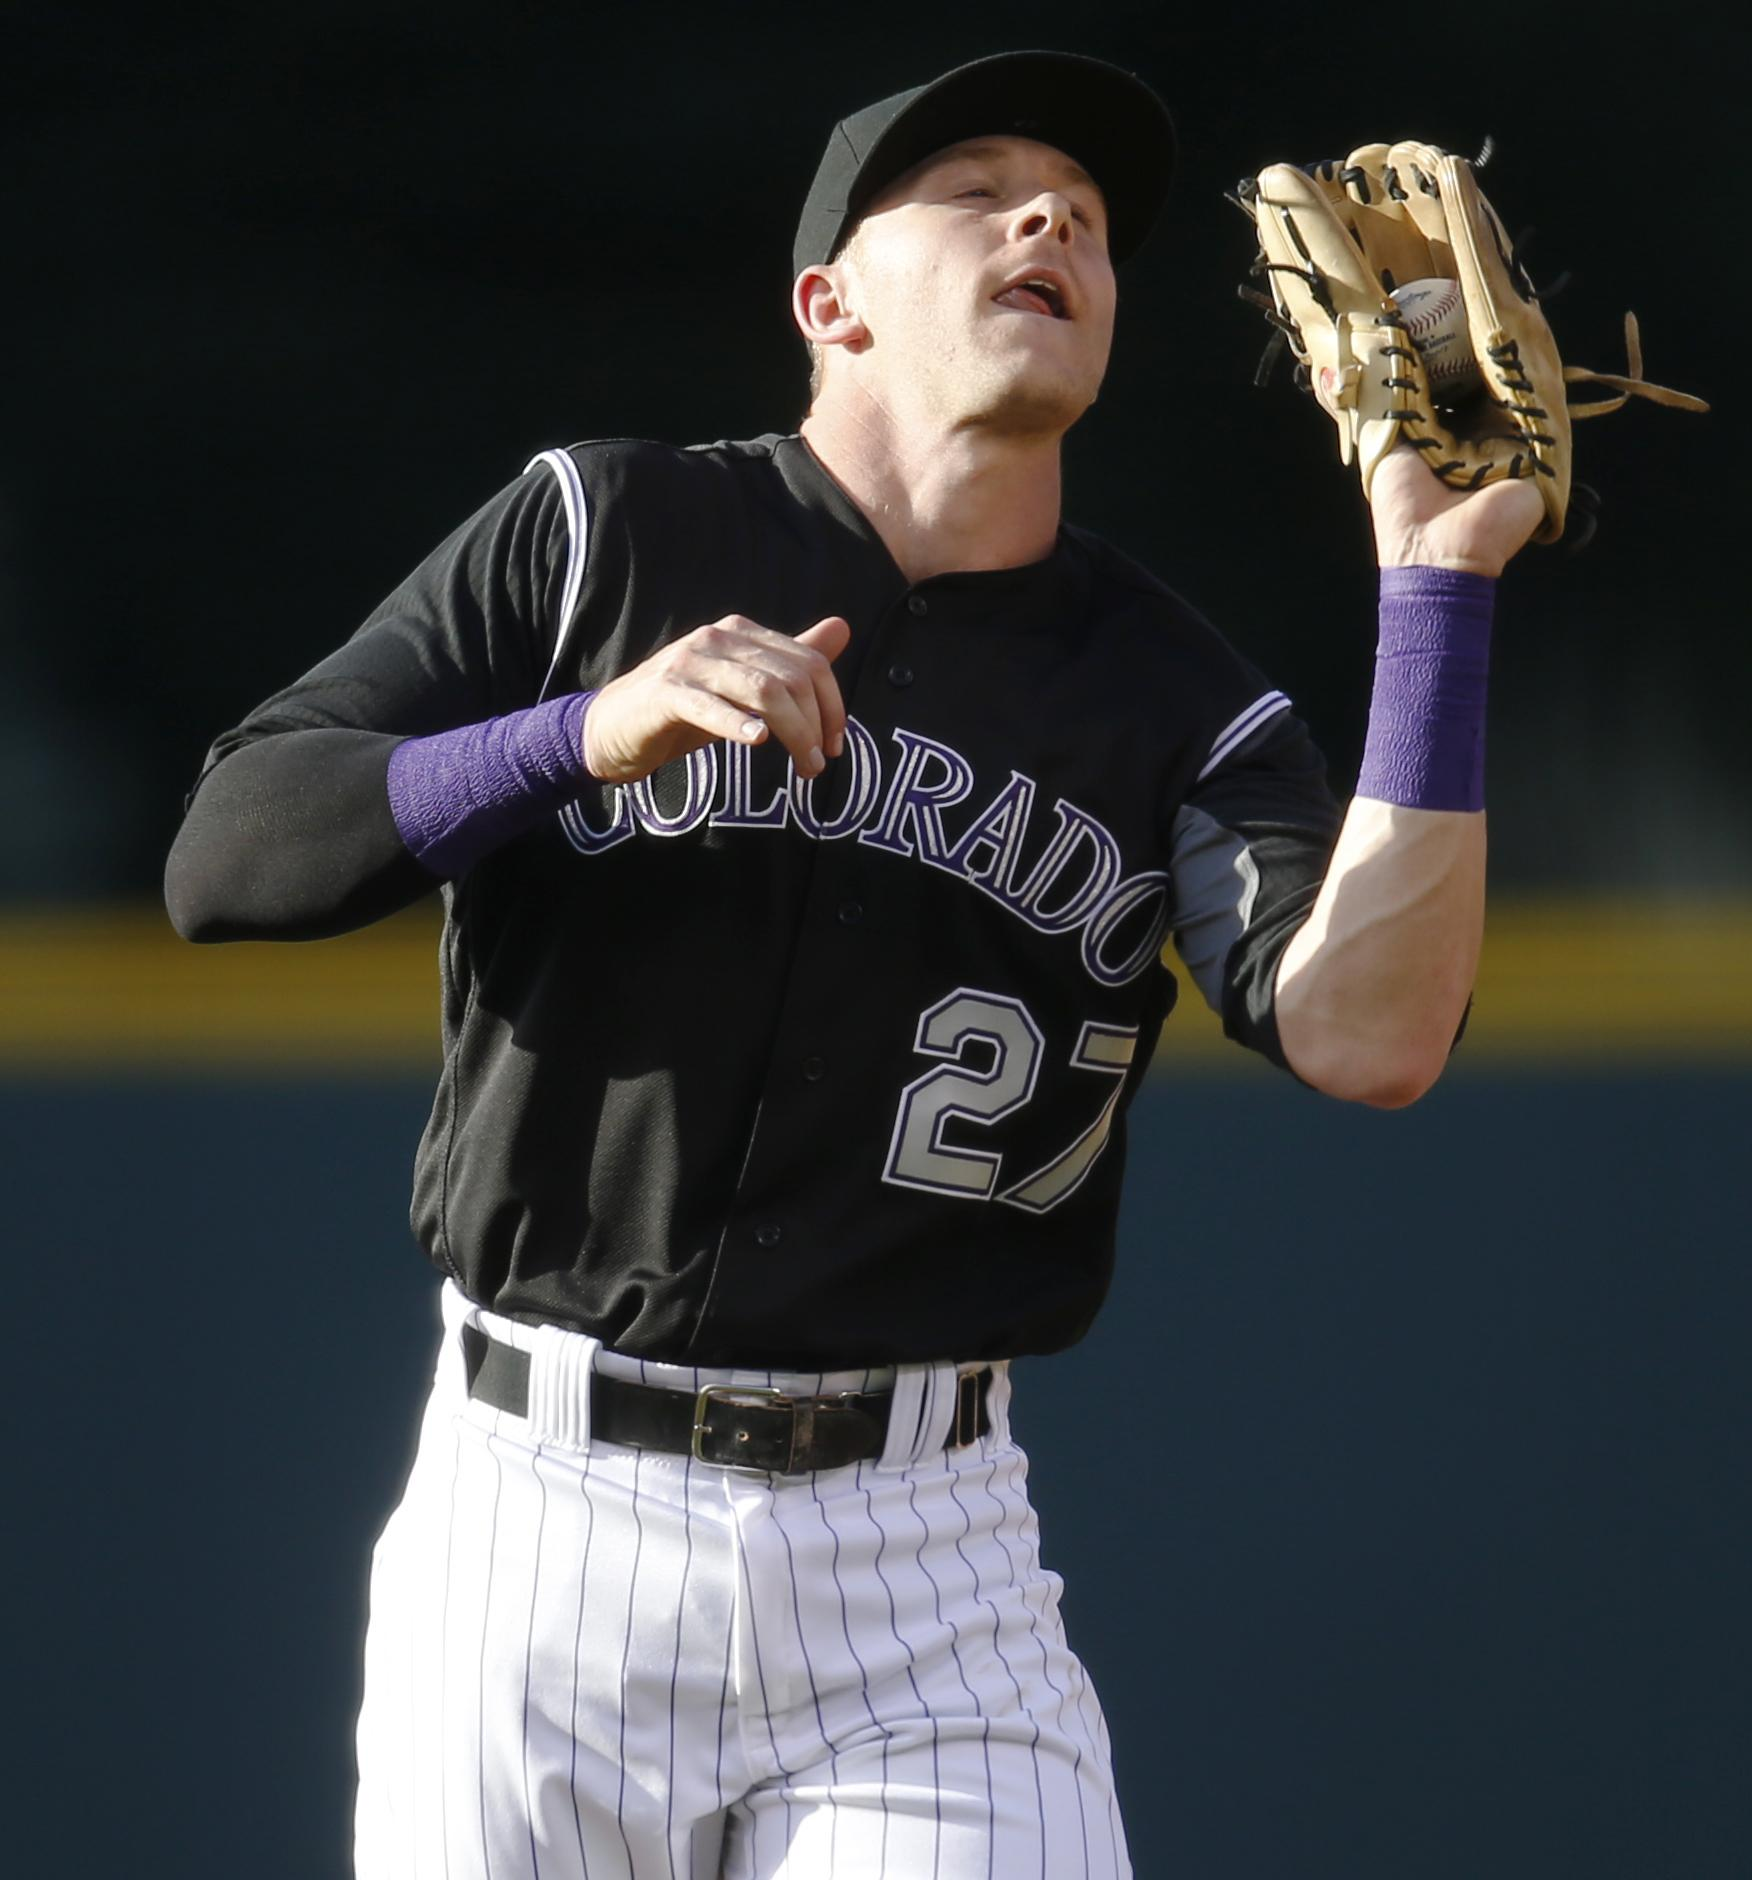 Phillies_rockies_baseball